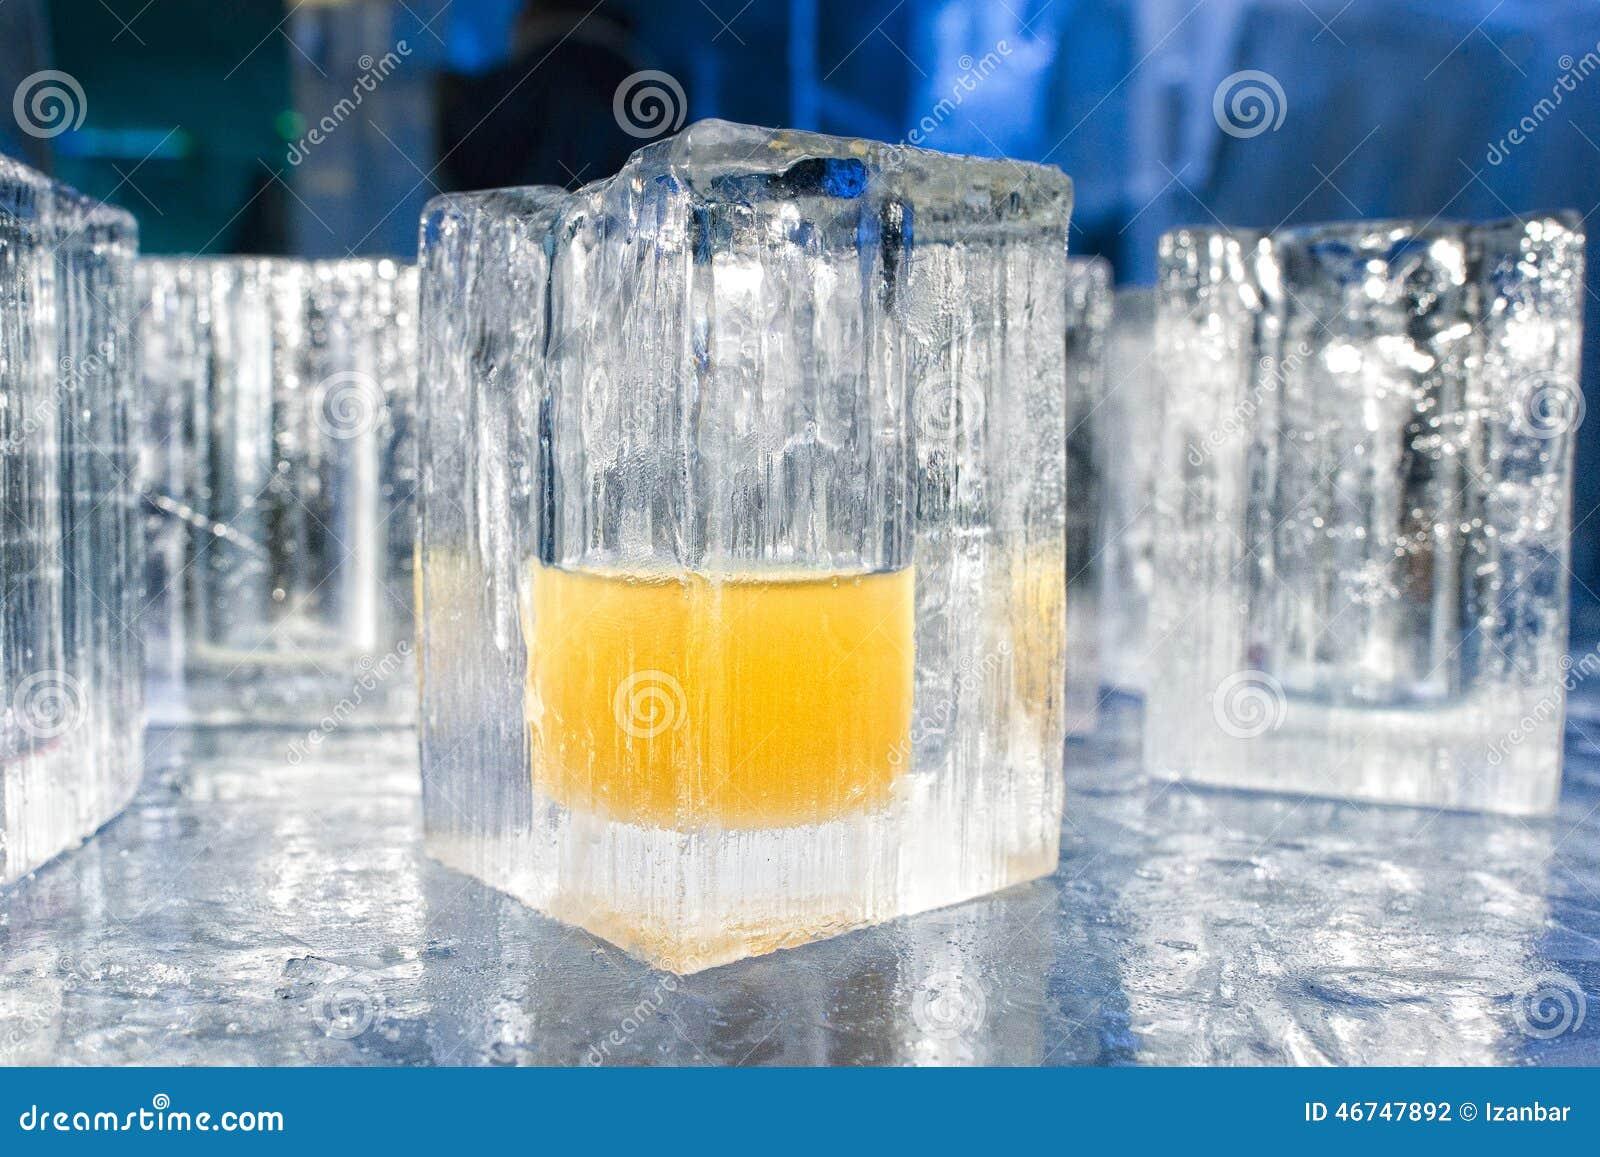 verres de blocs de glace dans un bar de bar du h tel de glace photo stock image 46747892. Black Bedroom Furniture Sets. Home Design Ideas